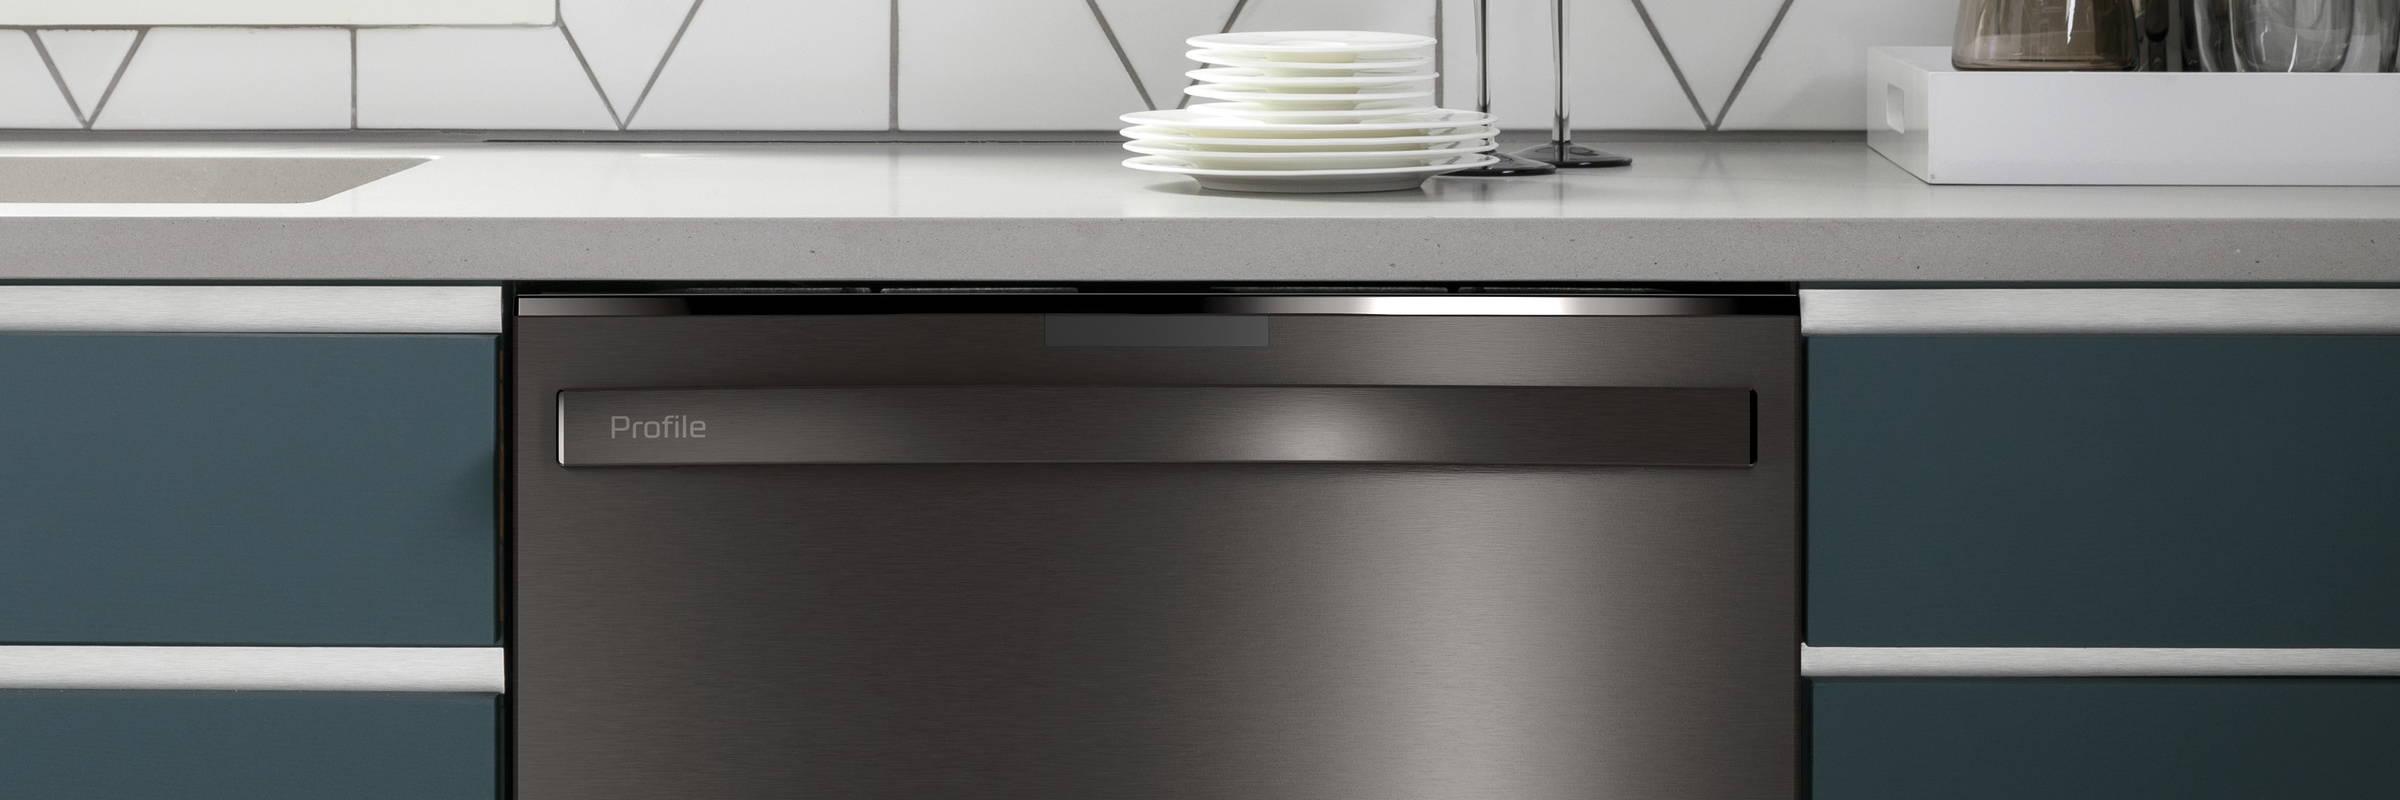 GE Profile Smart Dishwasher Kitchen